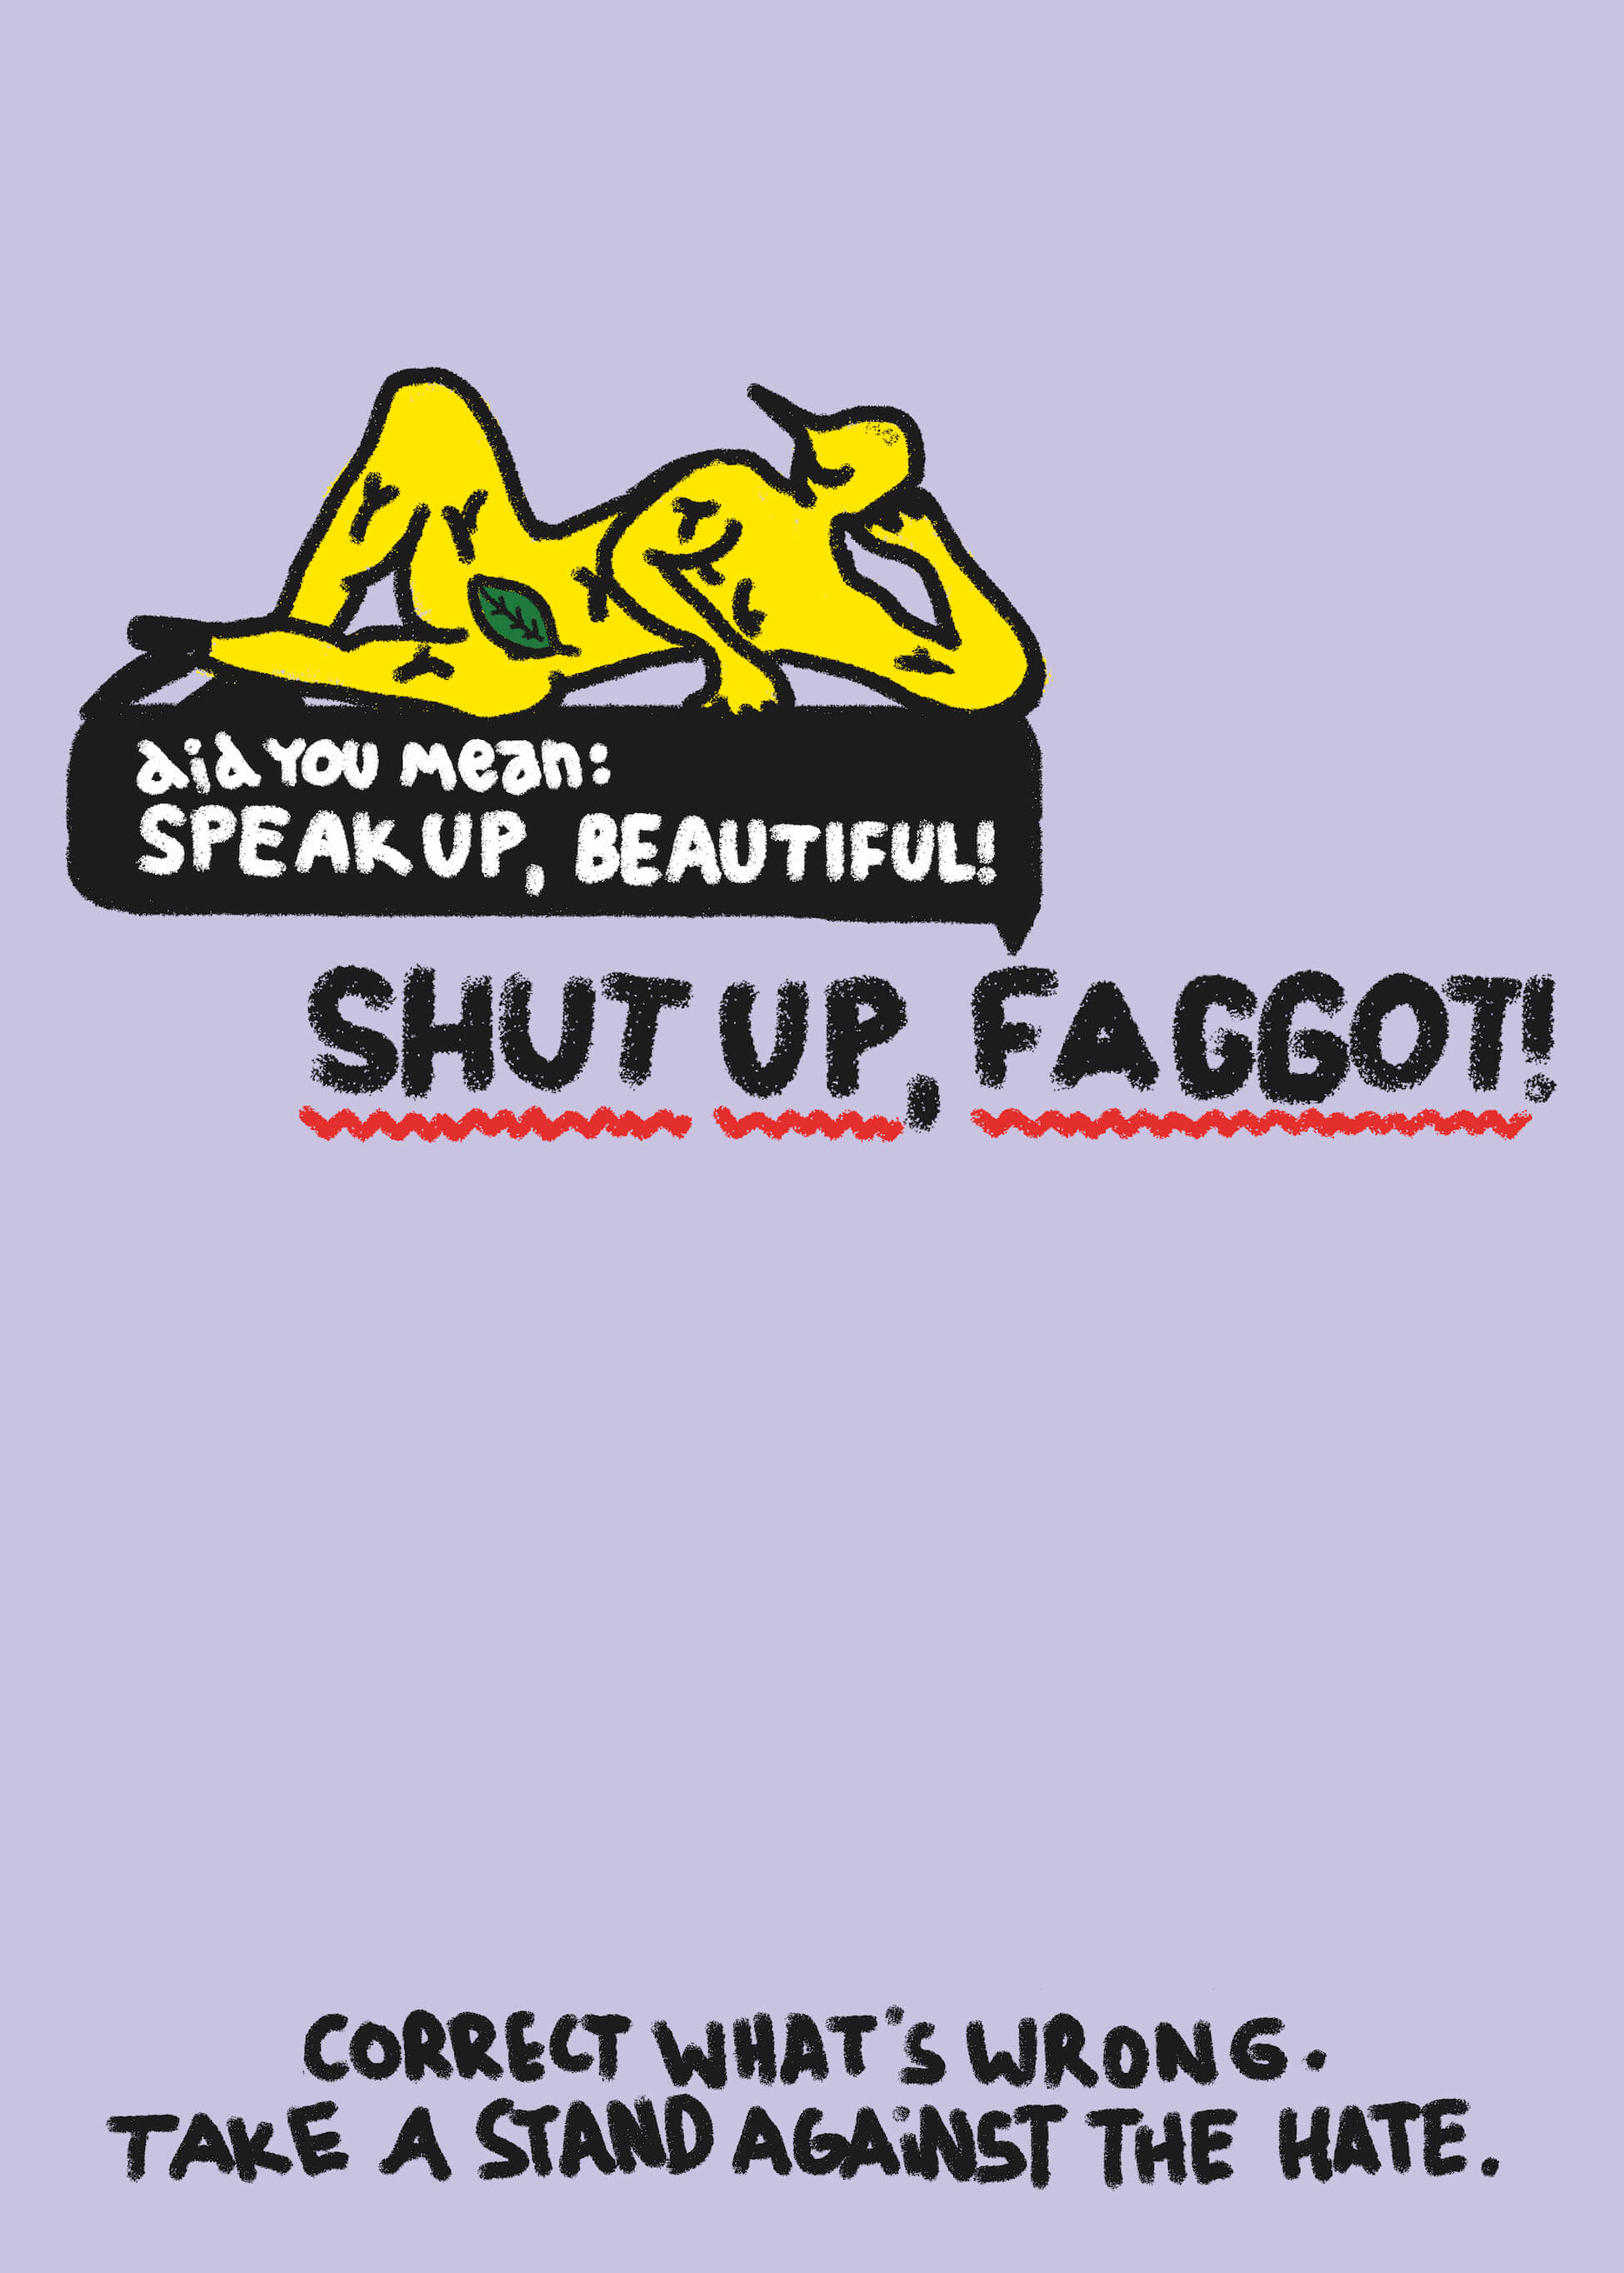 Speak Up, Beautiful (series 3/3) main image